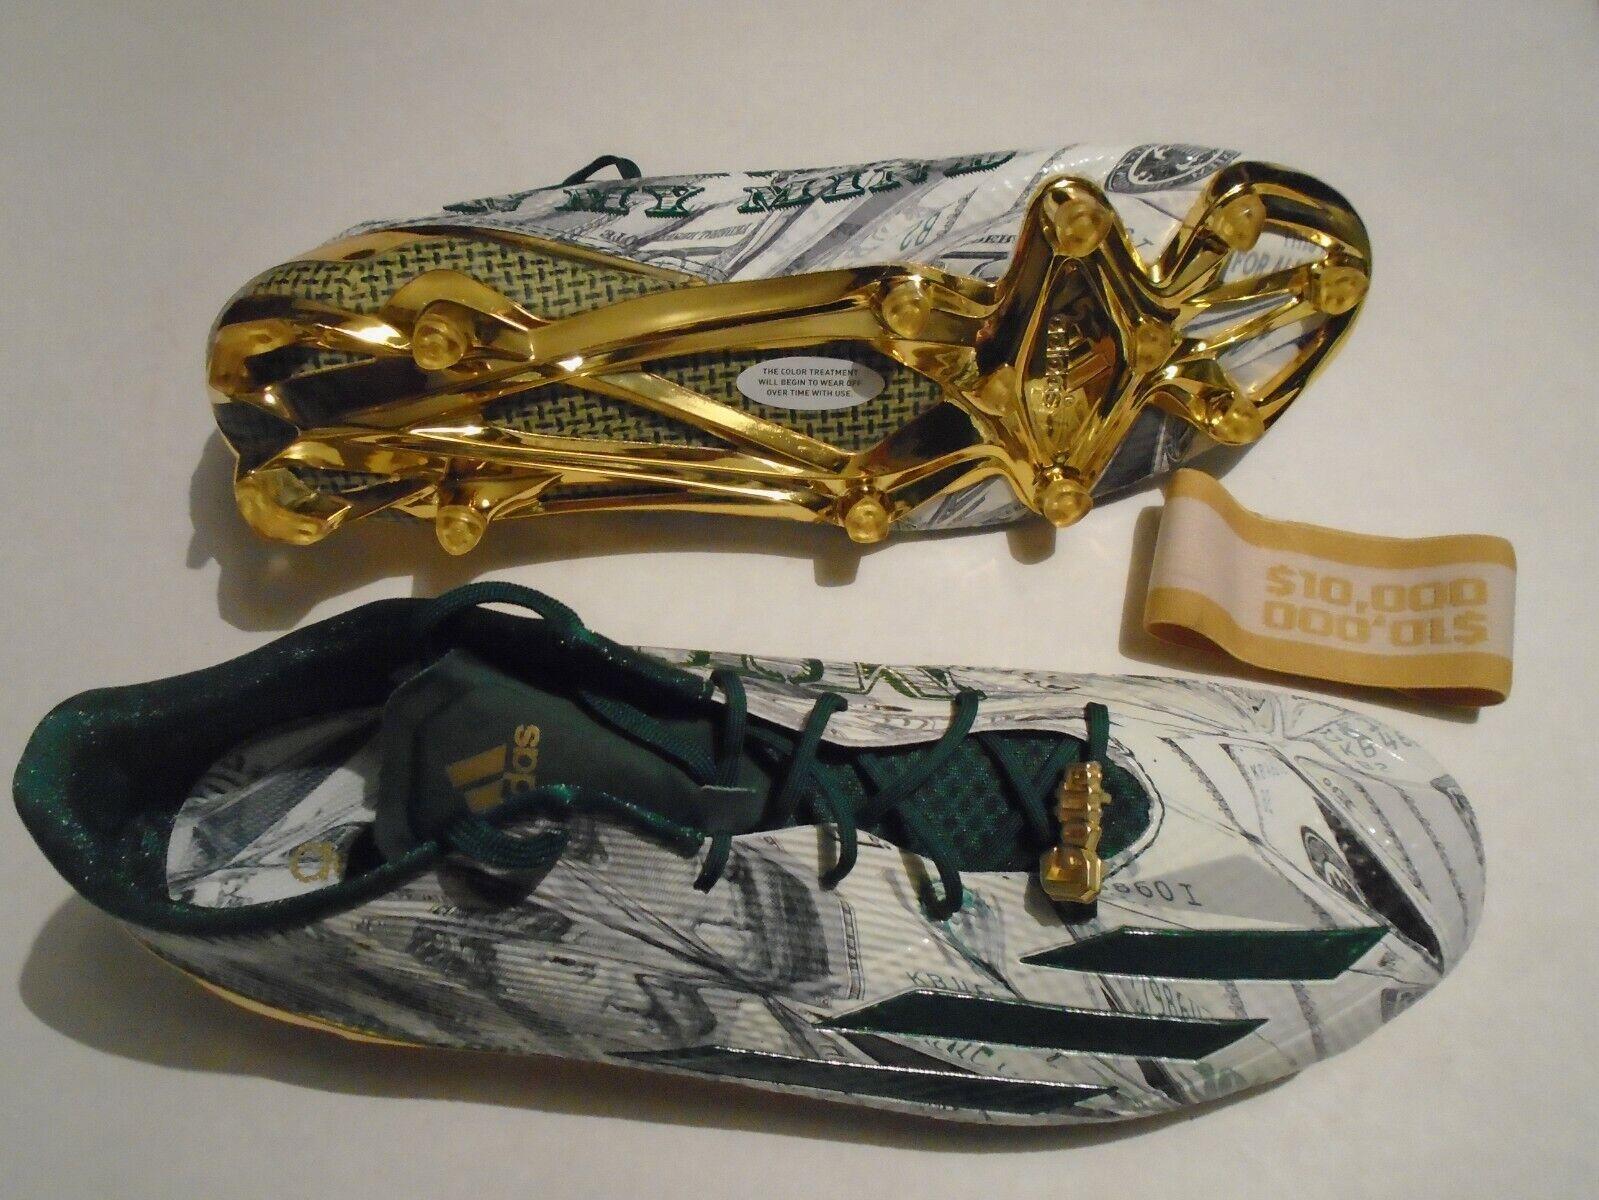 New Adidas Adizero 5.0 Snoop Dogg Gotta Hustle Size 16 Football Cleats D70177